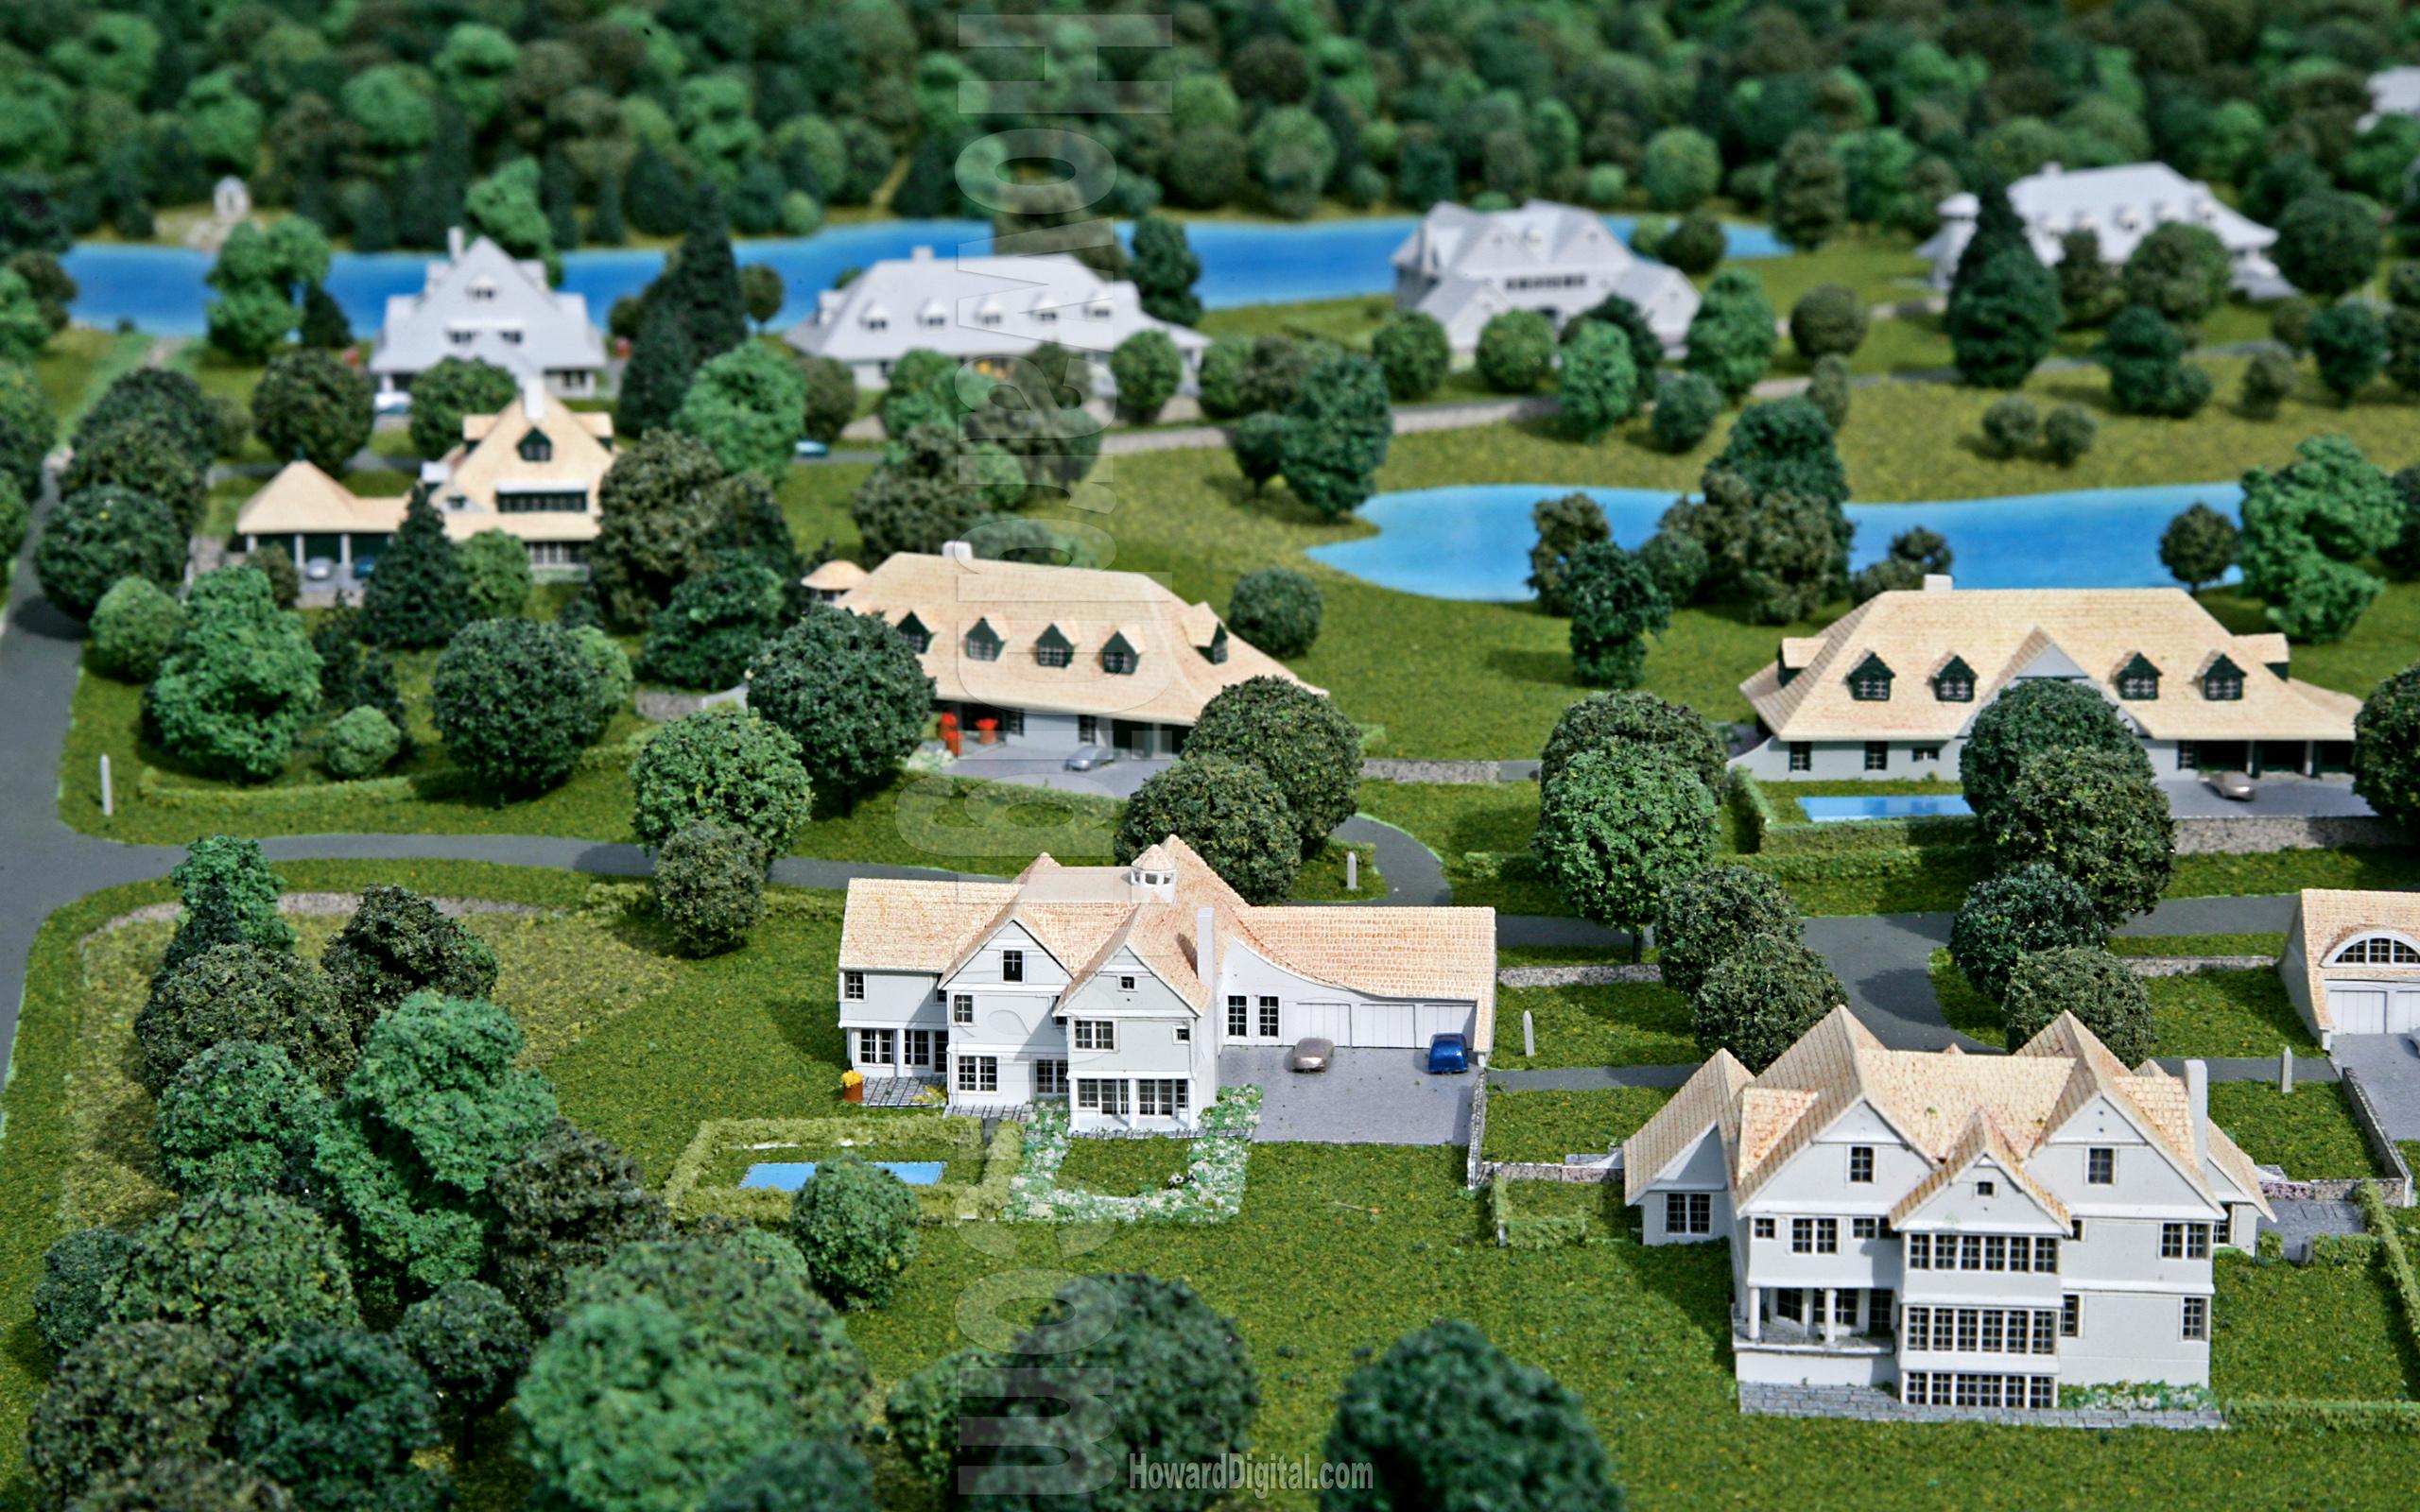 Windermere - Architectural Model - Howard Architectural Models